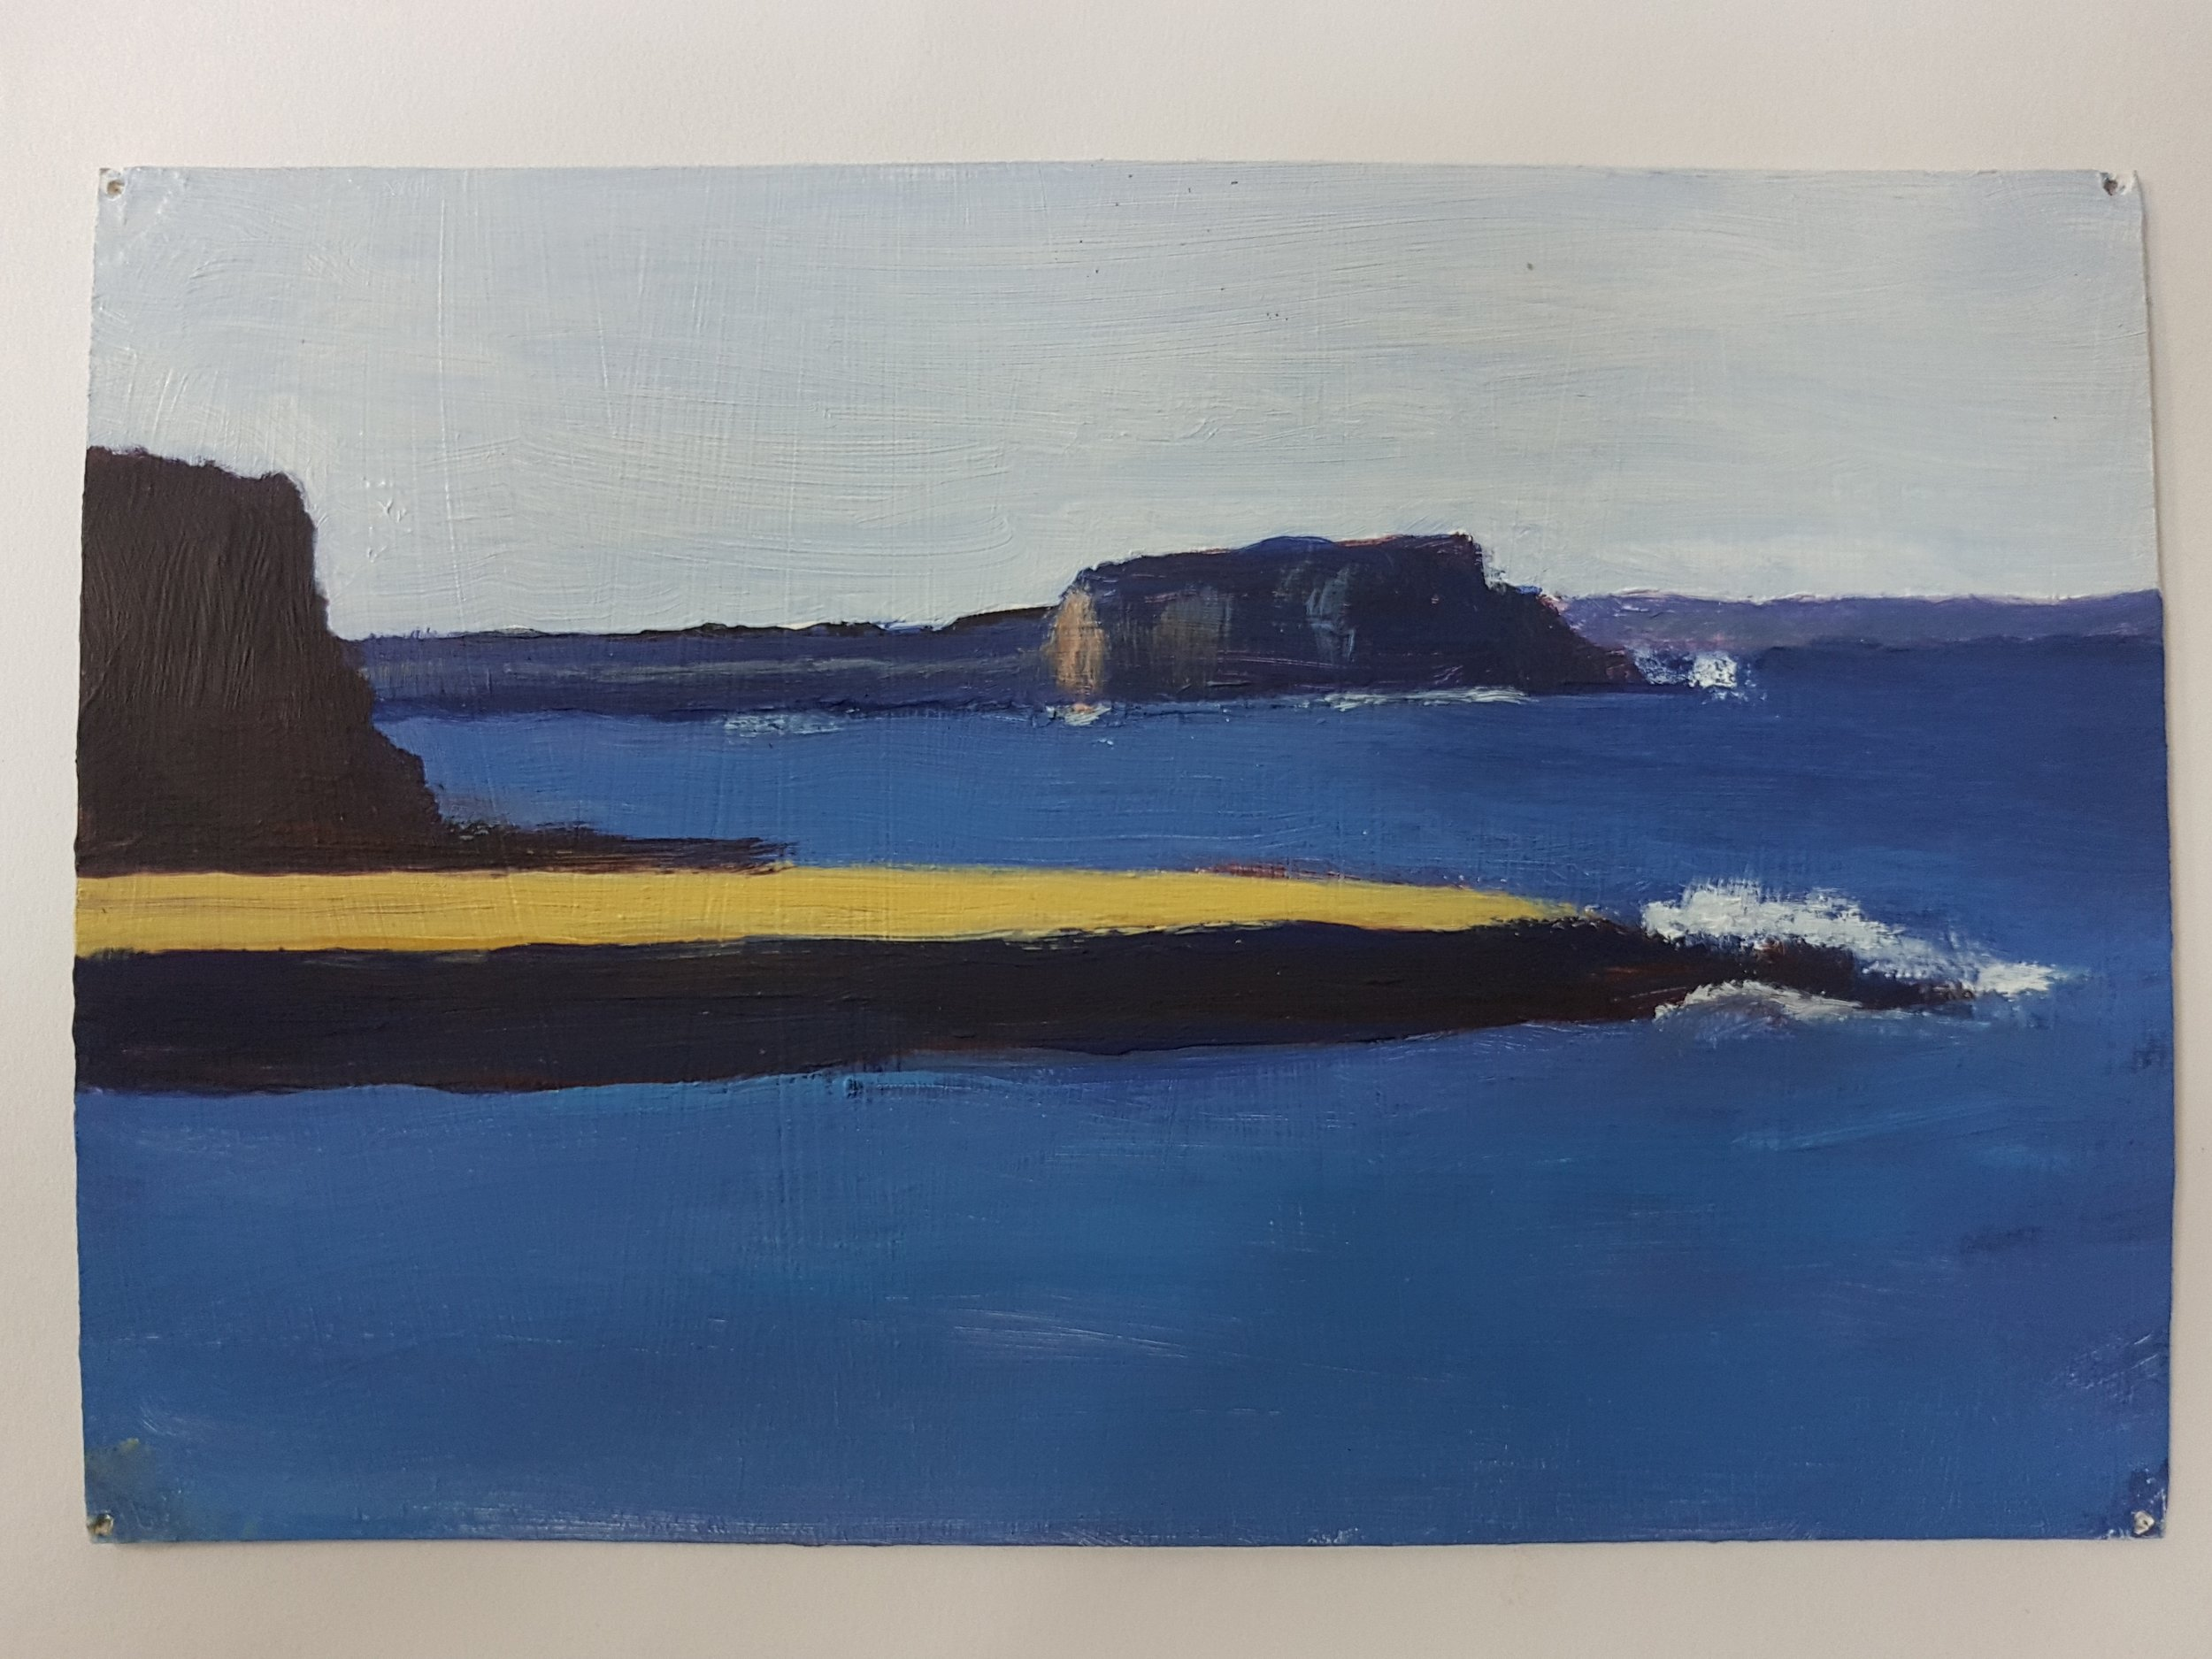 SOLD 2018-025 Sketch for Kiama (View to Bombo Headland)